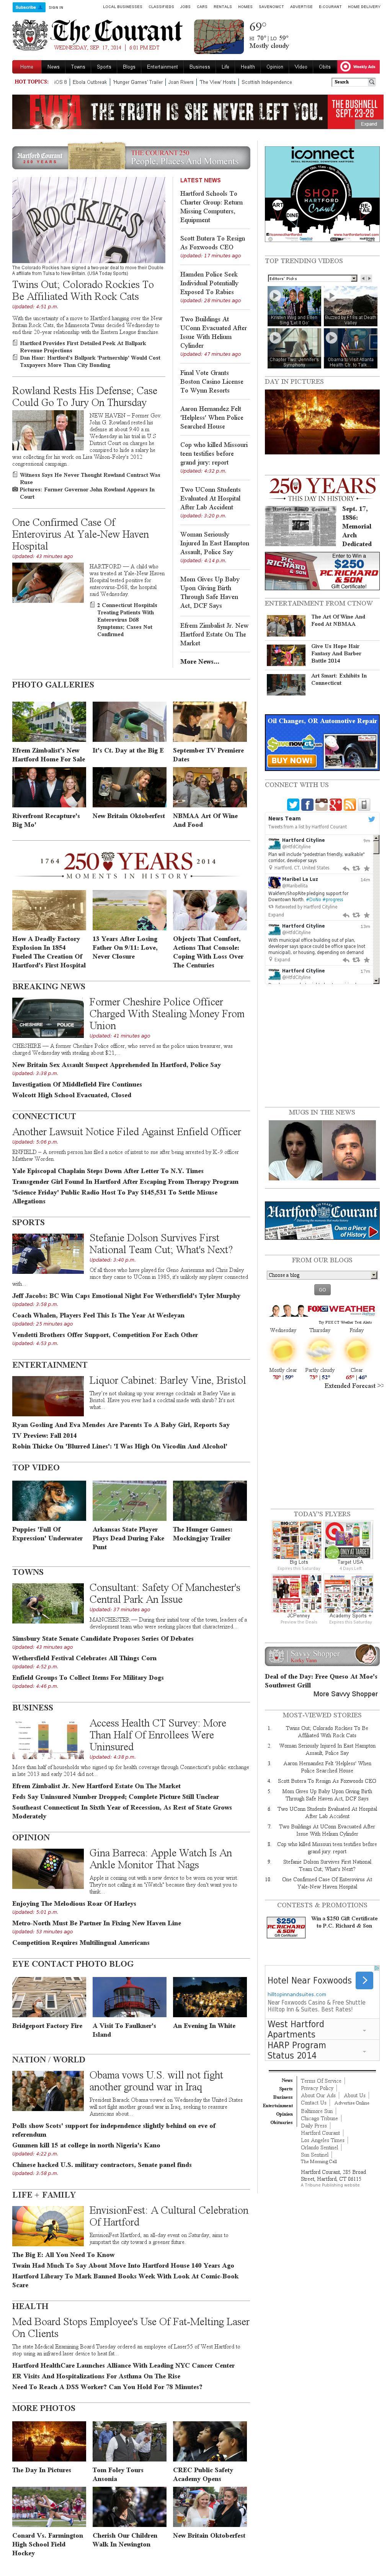 Hartford Courant at Wednesday Sept. 17, 2014, 10:08 p.m. UTC